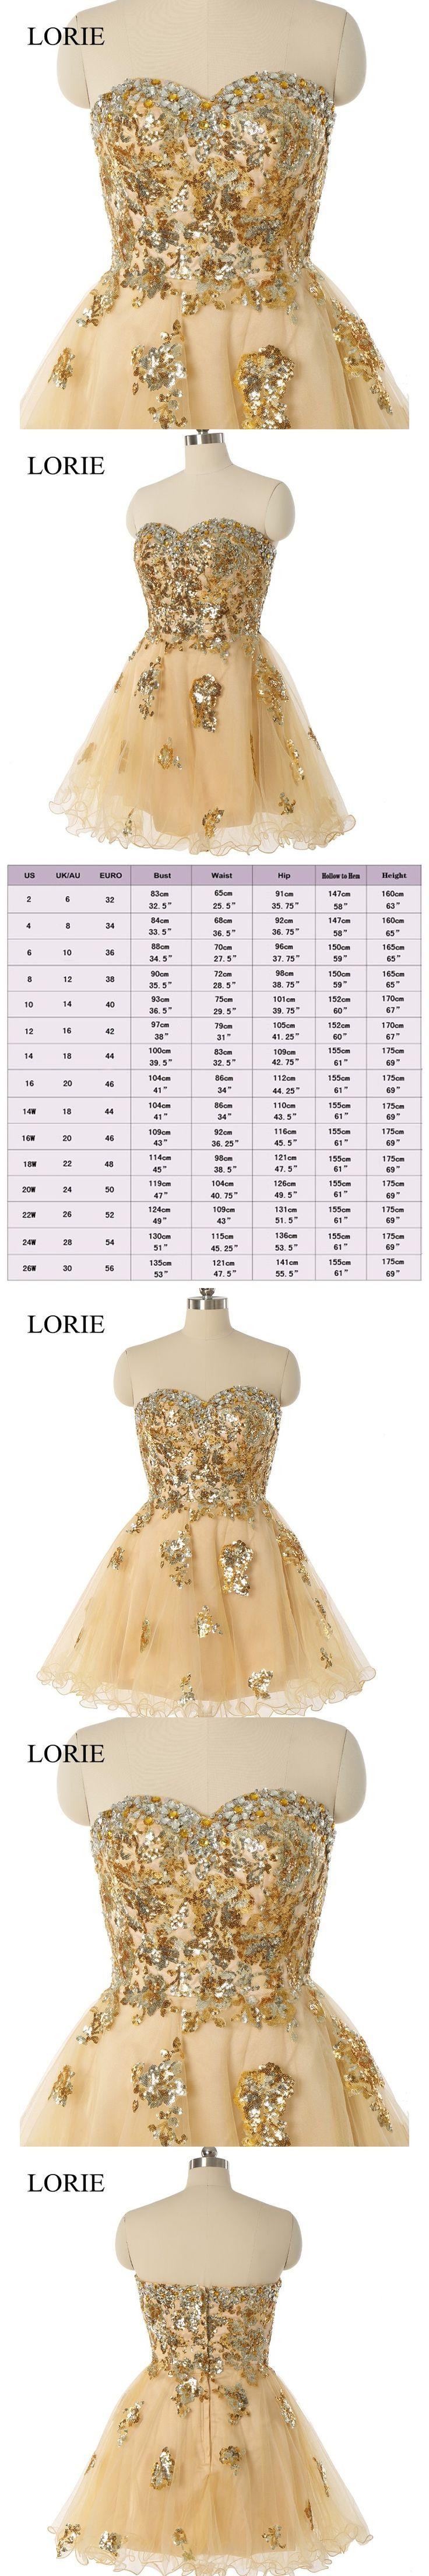 Sparking Gold Sequin Short Prom Dresses 2017 Robe De Soiree Sweethert Crystals Beaded Teens Graduacion Masquerade Party Dresses